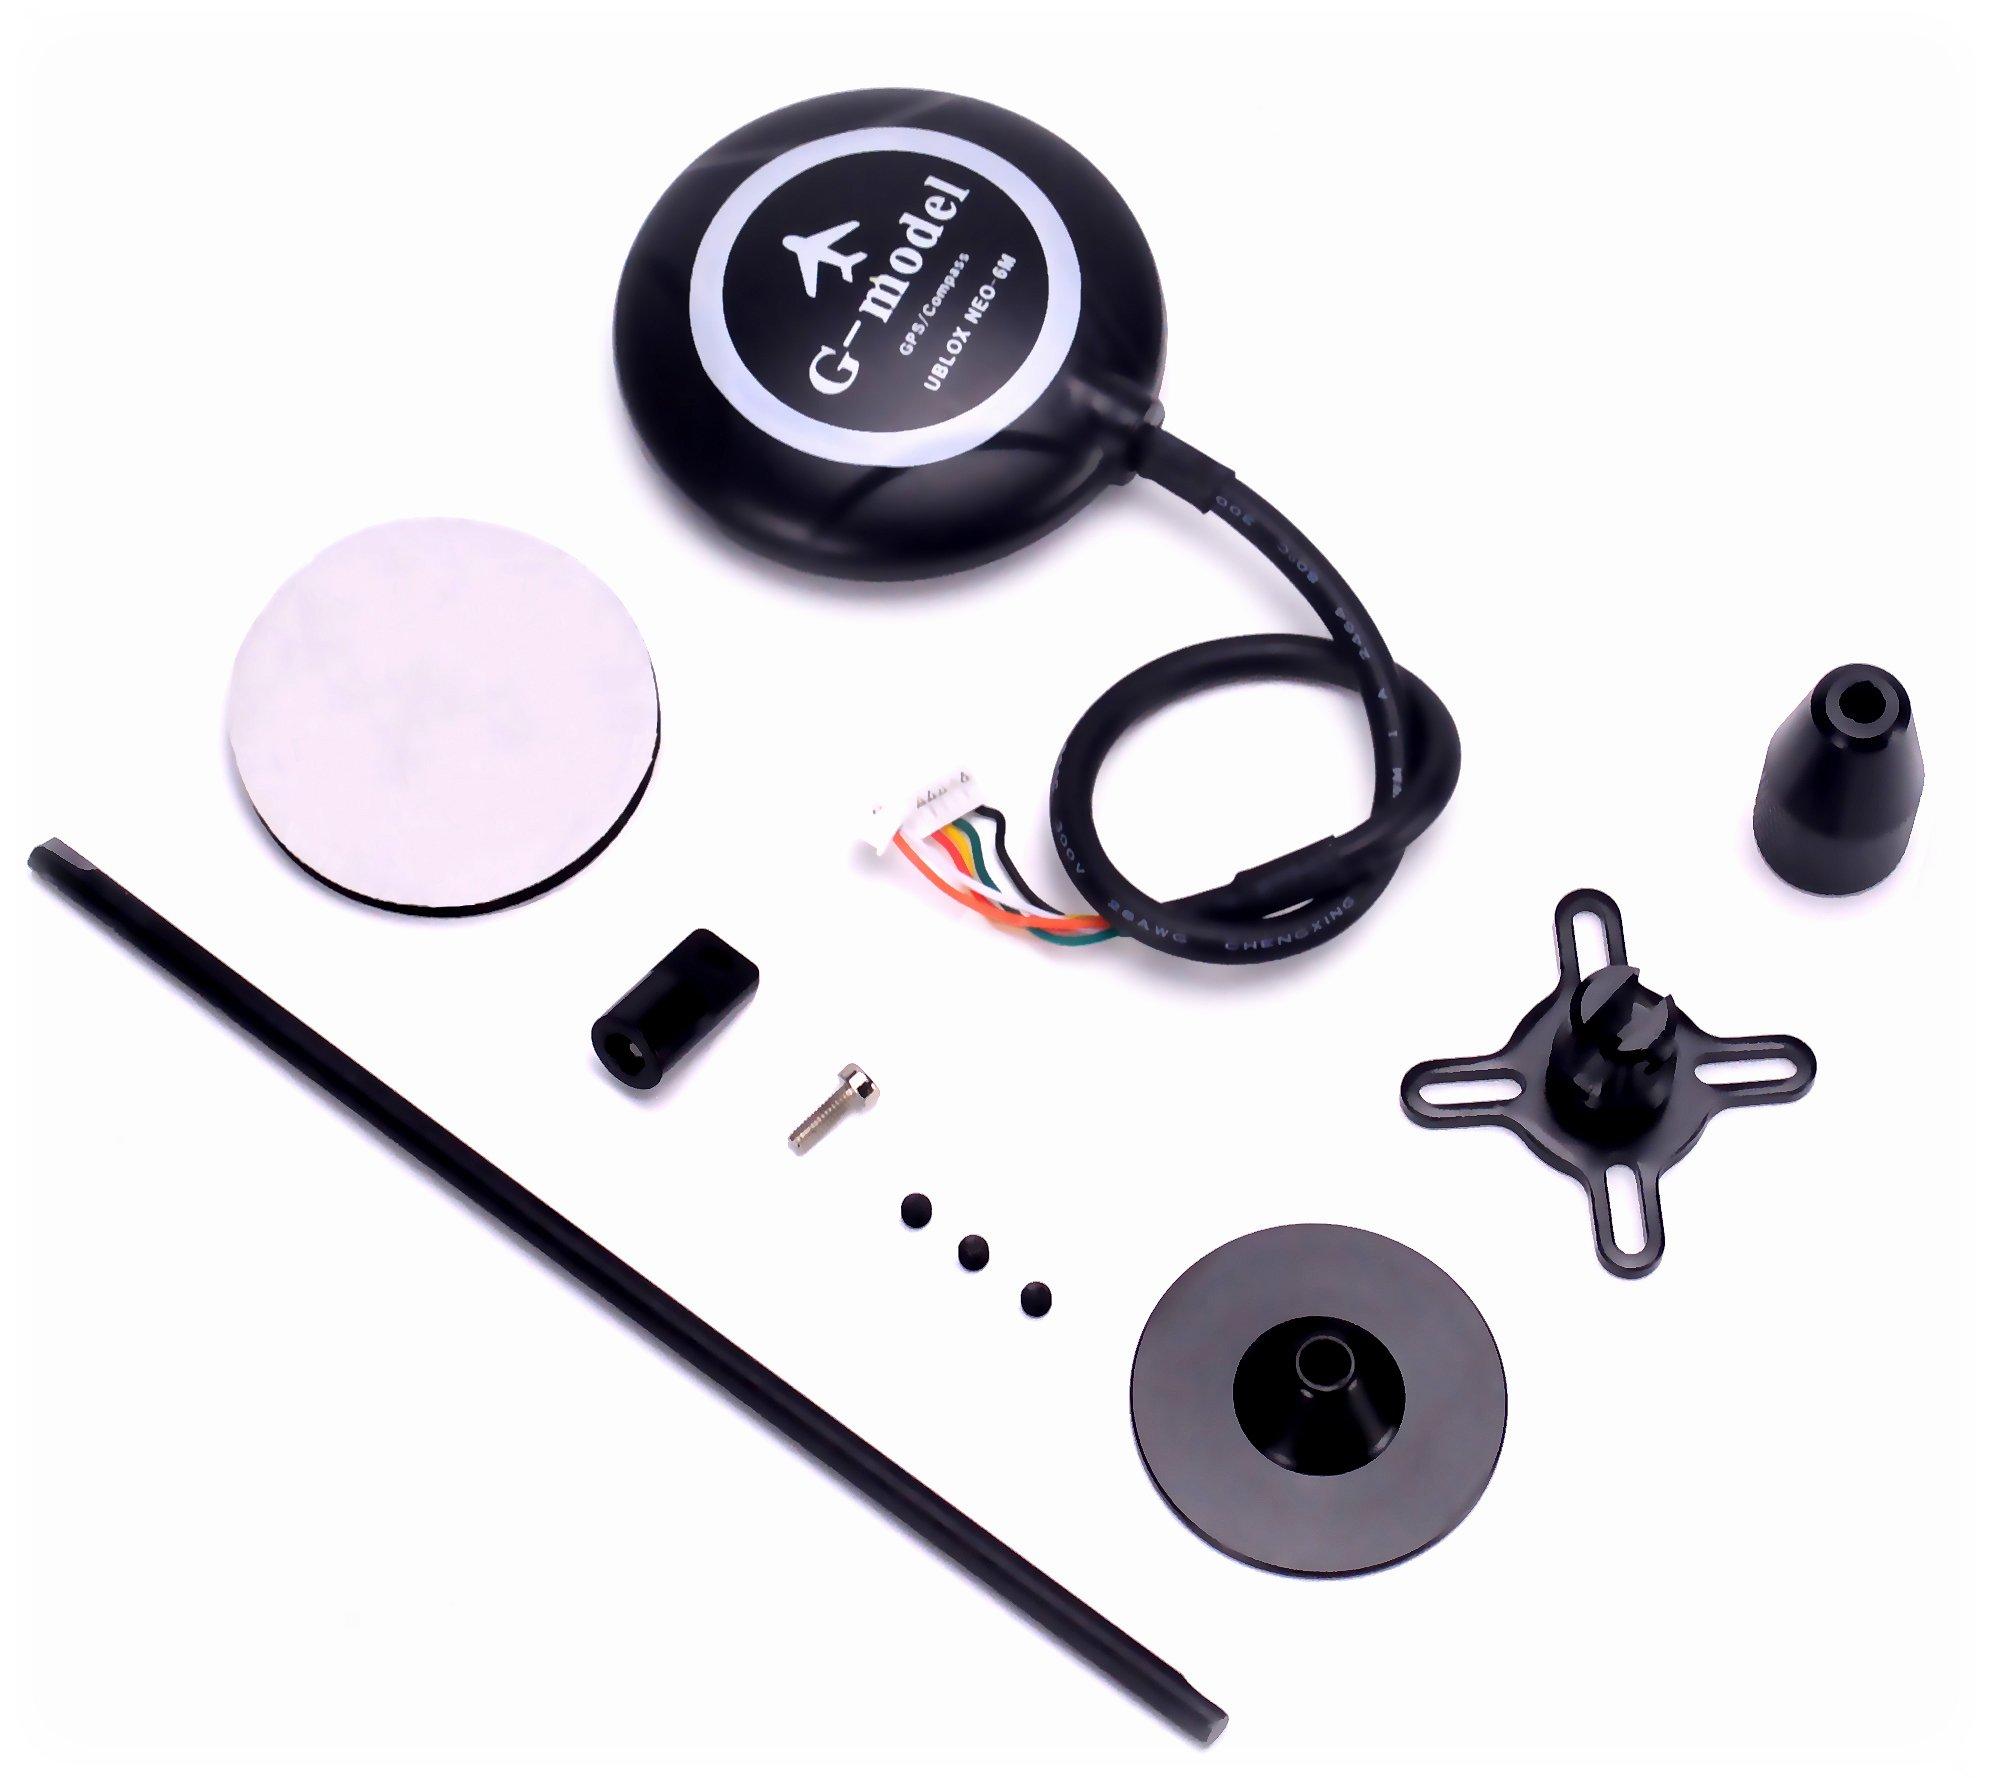 FPVKing 6M GPS Module Built-in Compass 5983 GPS +Black GPS Folding Seat Holder for FPV Multicopter APM APM2.6 APM2.8 Pixhawk Flight Controller